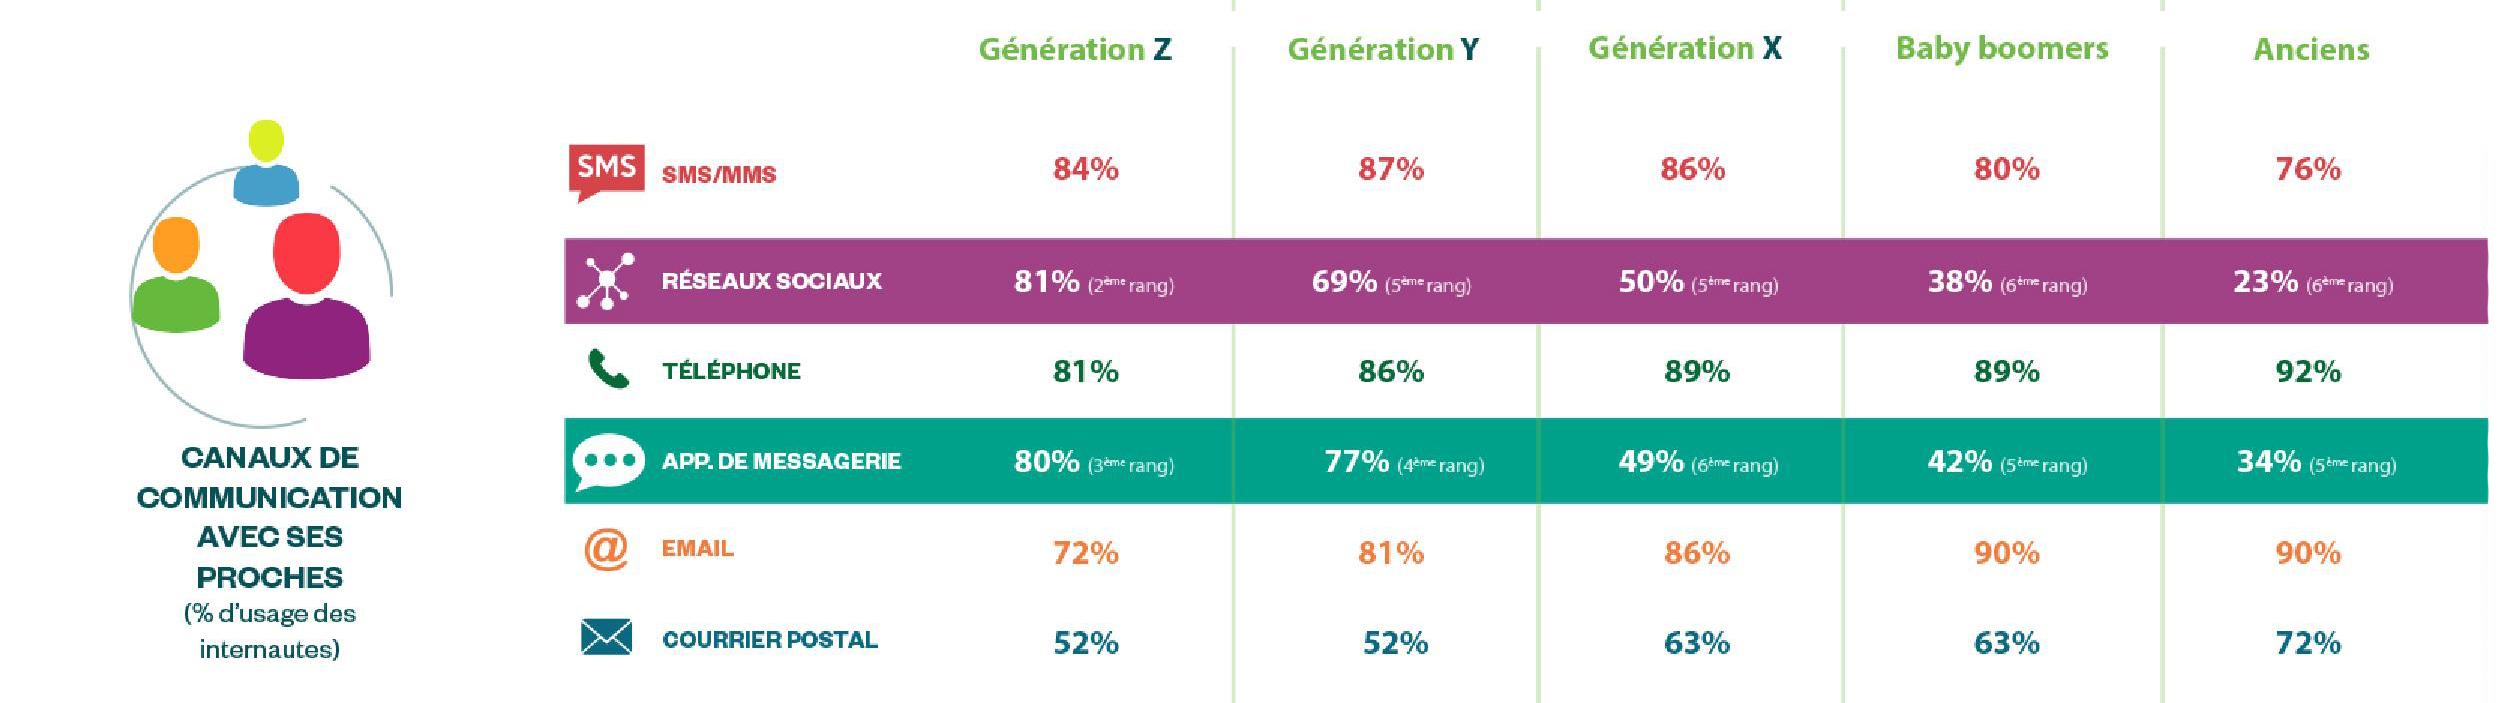 social-life-2017-infographie-harris-interactive- part-1